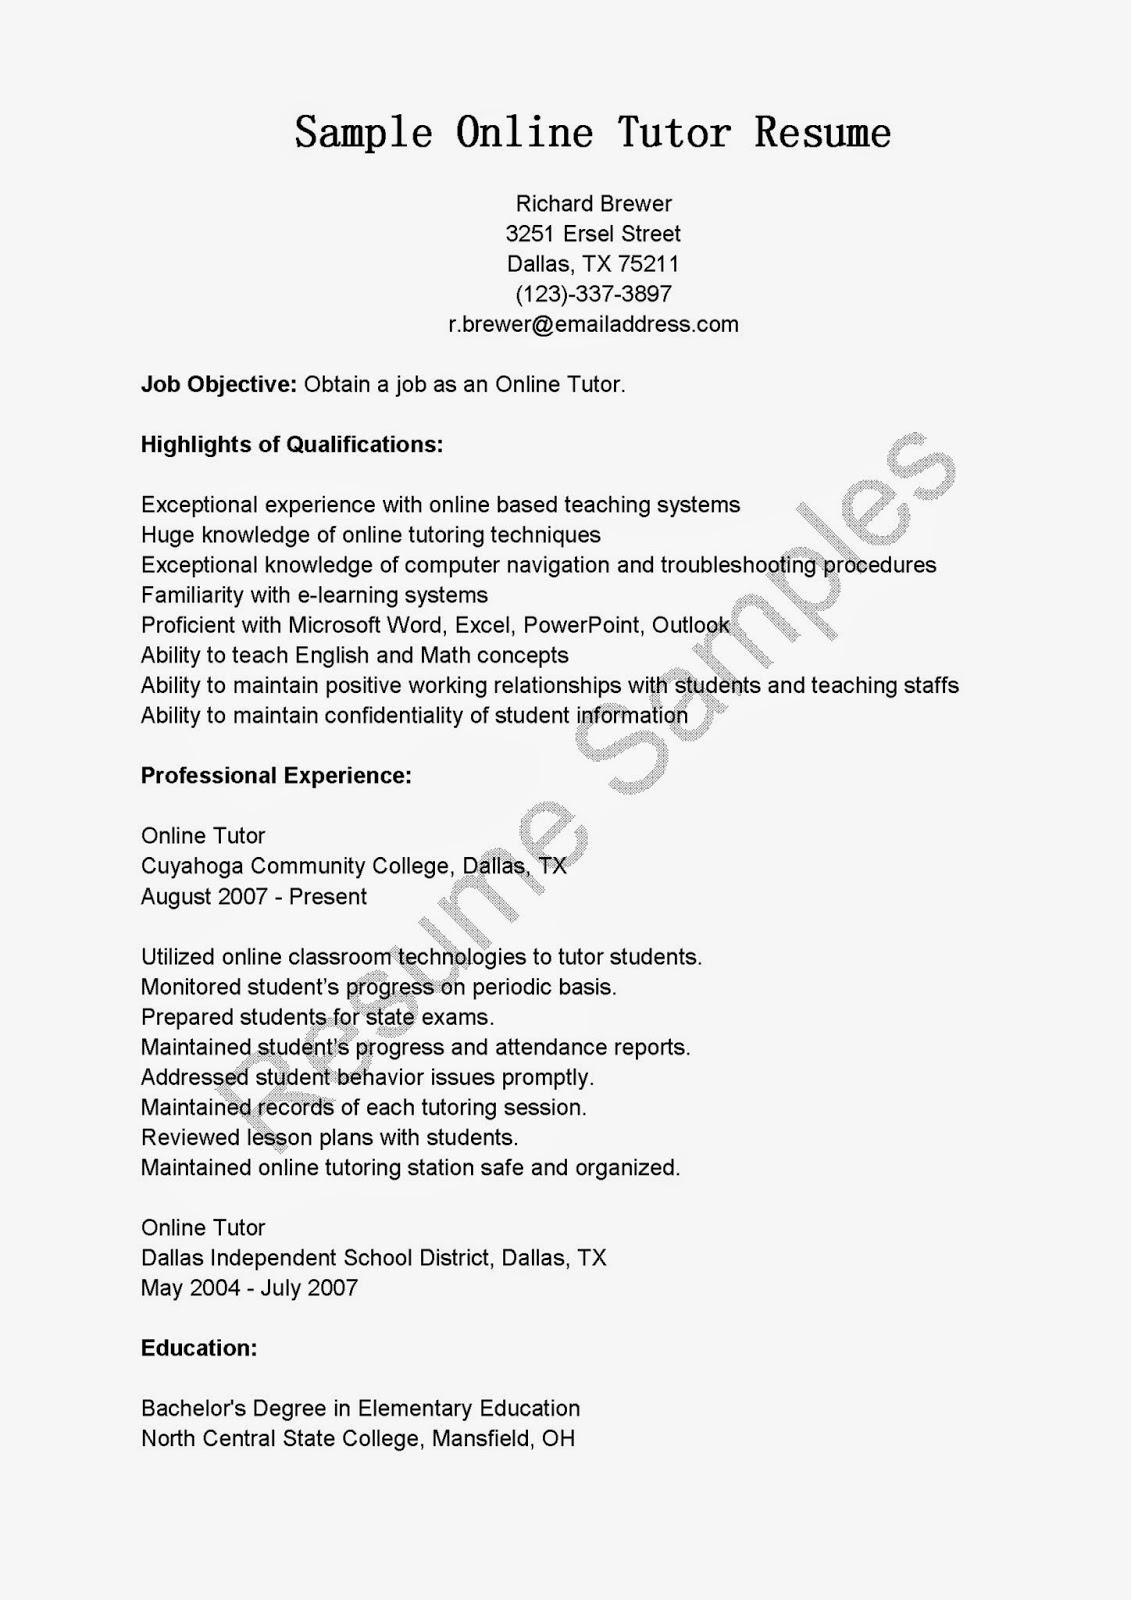 Resume Builder Websites Resume Builder Tips Can Online Help Iqchallenged  Digital Rights Management Resume Sample Resume  Free Resume Help Online